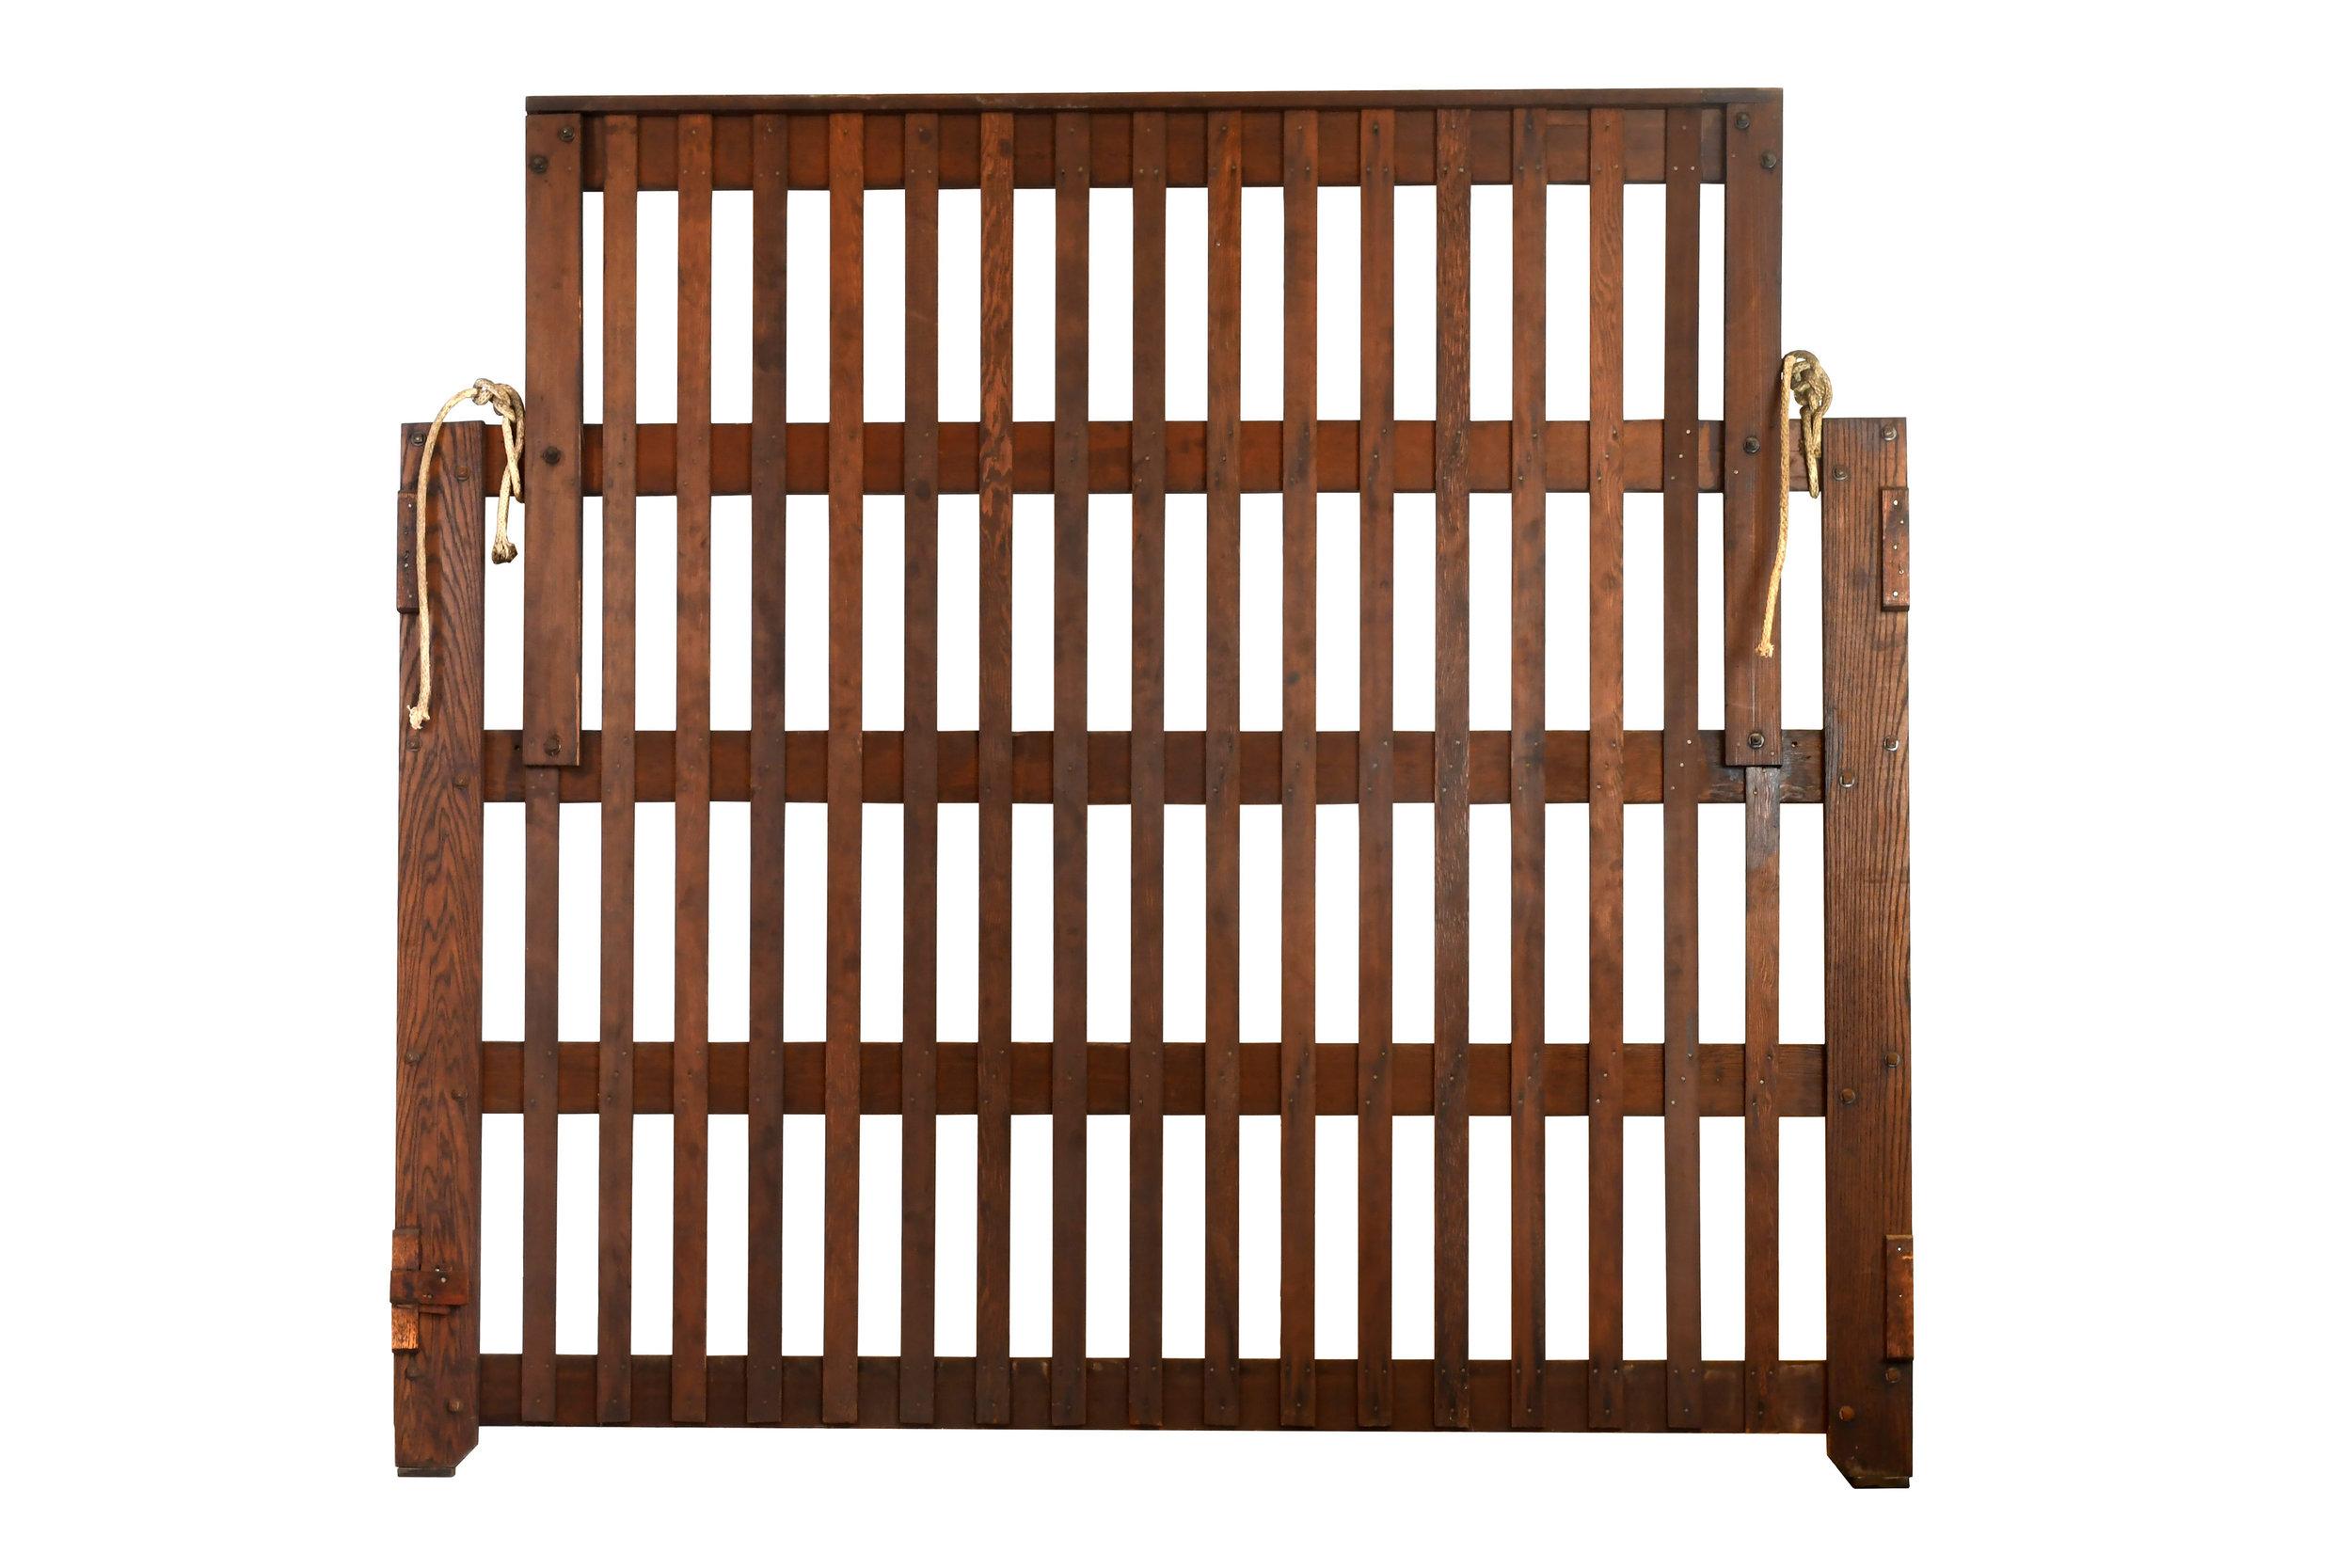 wood freight elevator gate